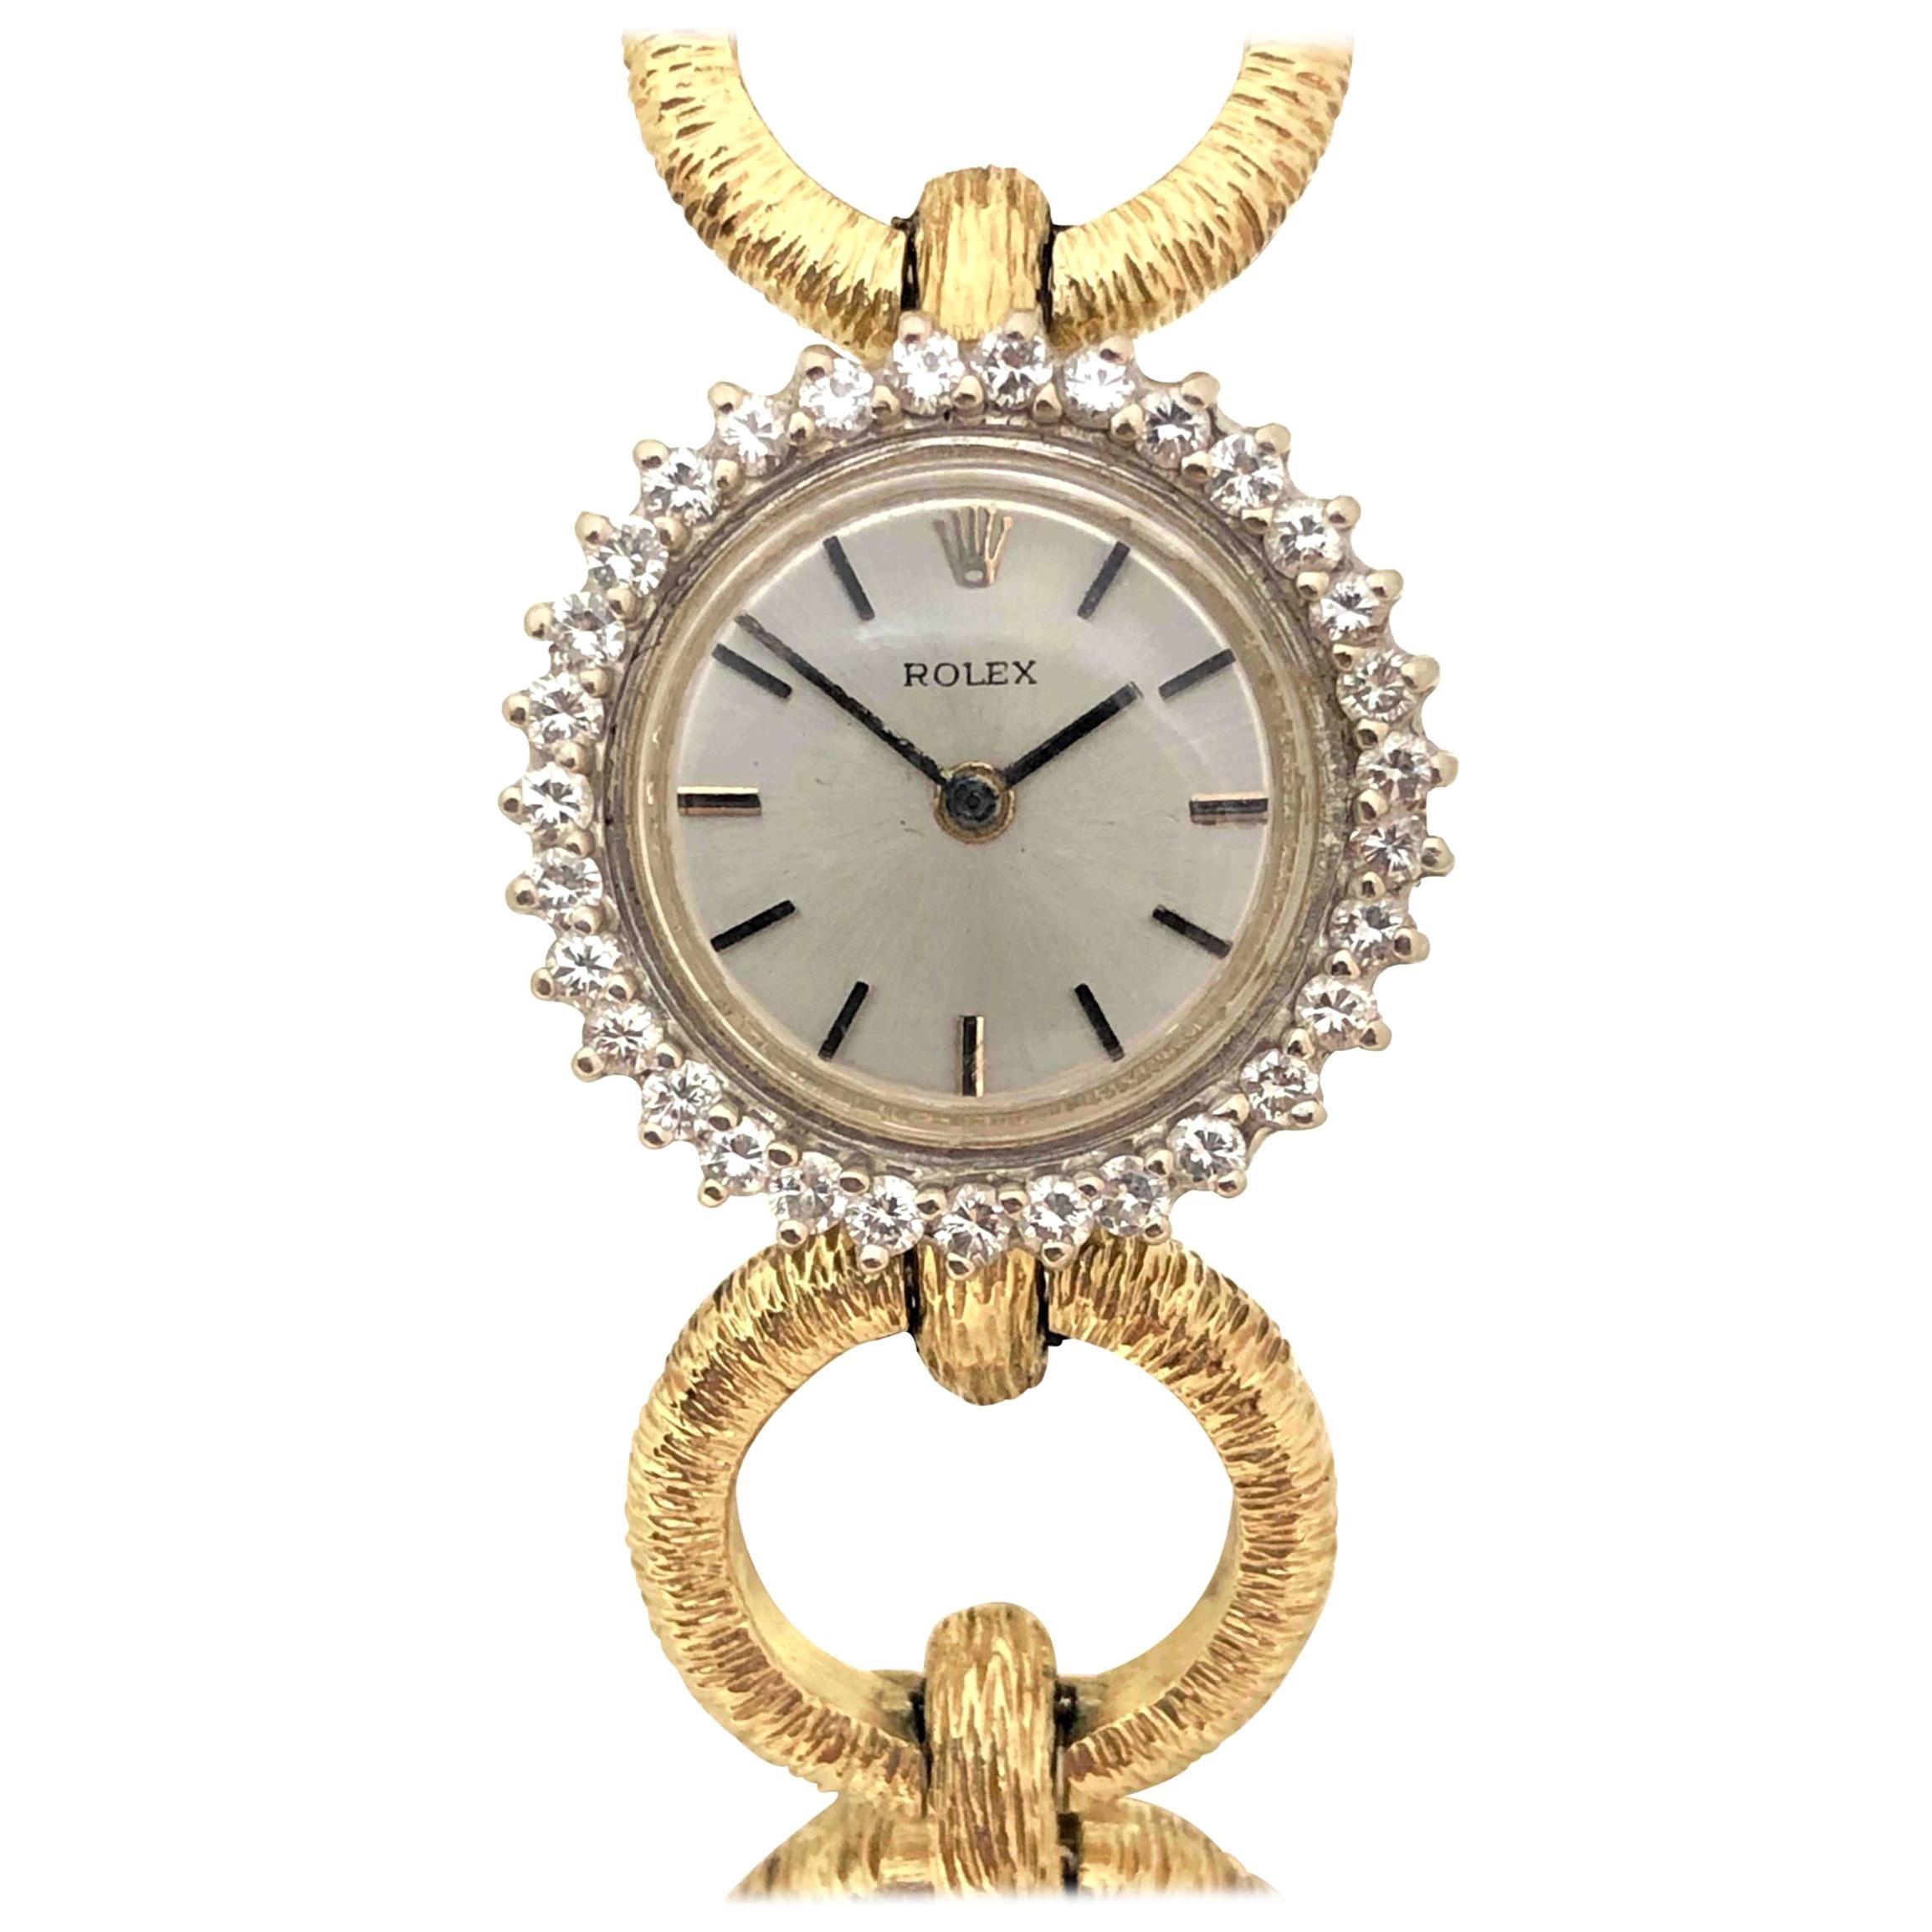 Rolex Ladies Yellow Gold and Diamond 1960s Bracelet Watch